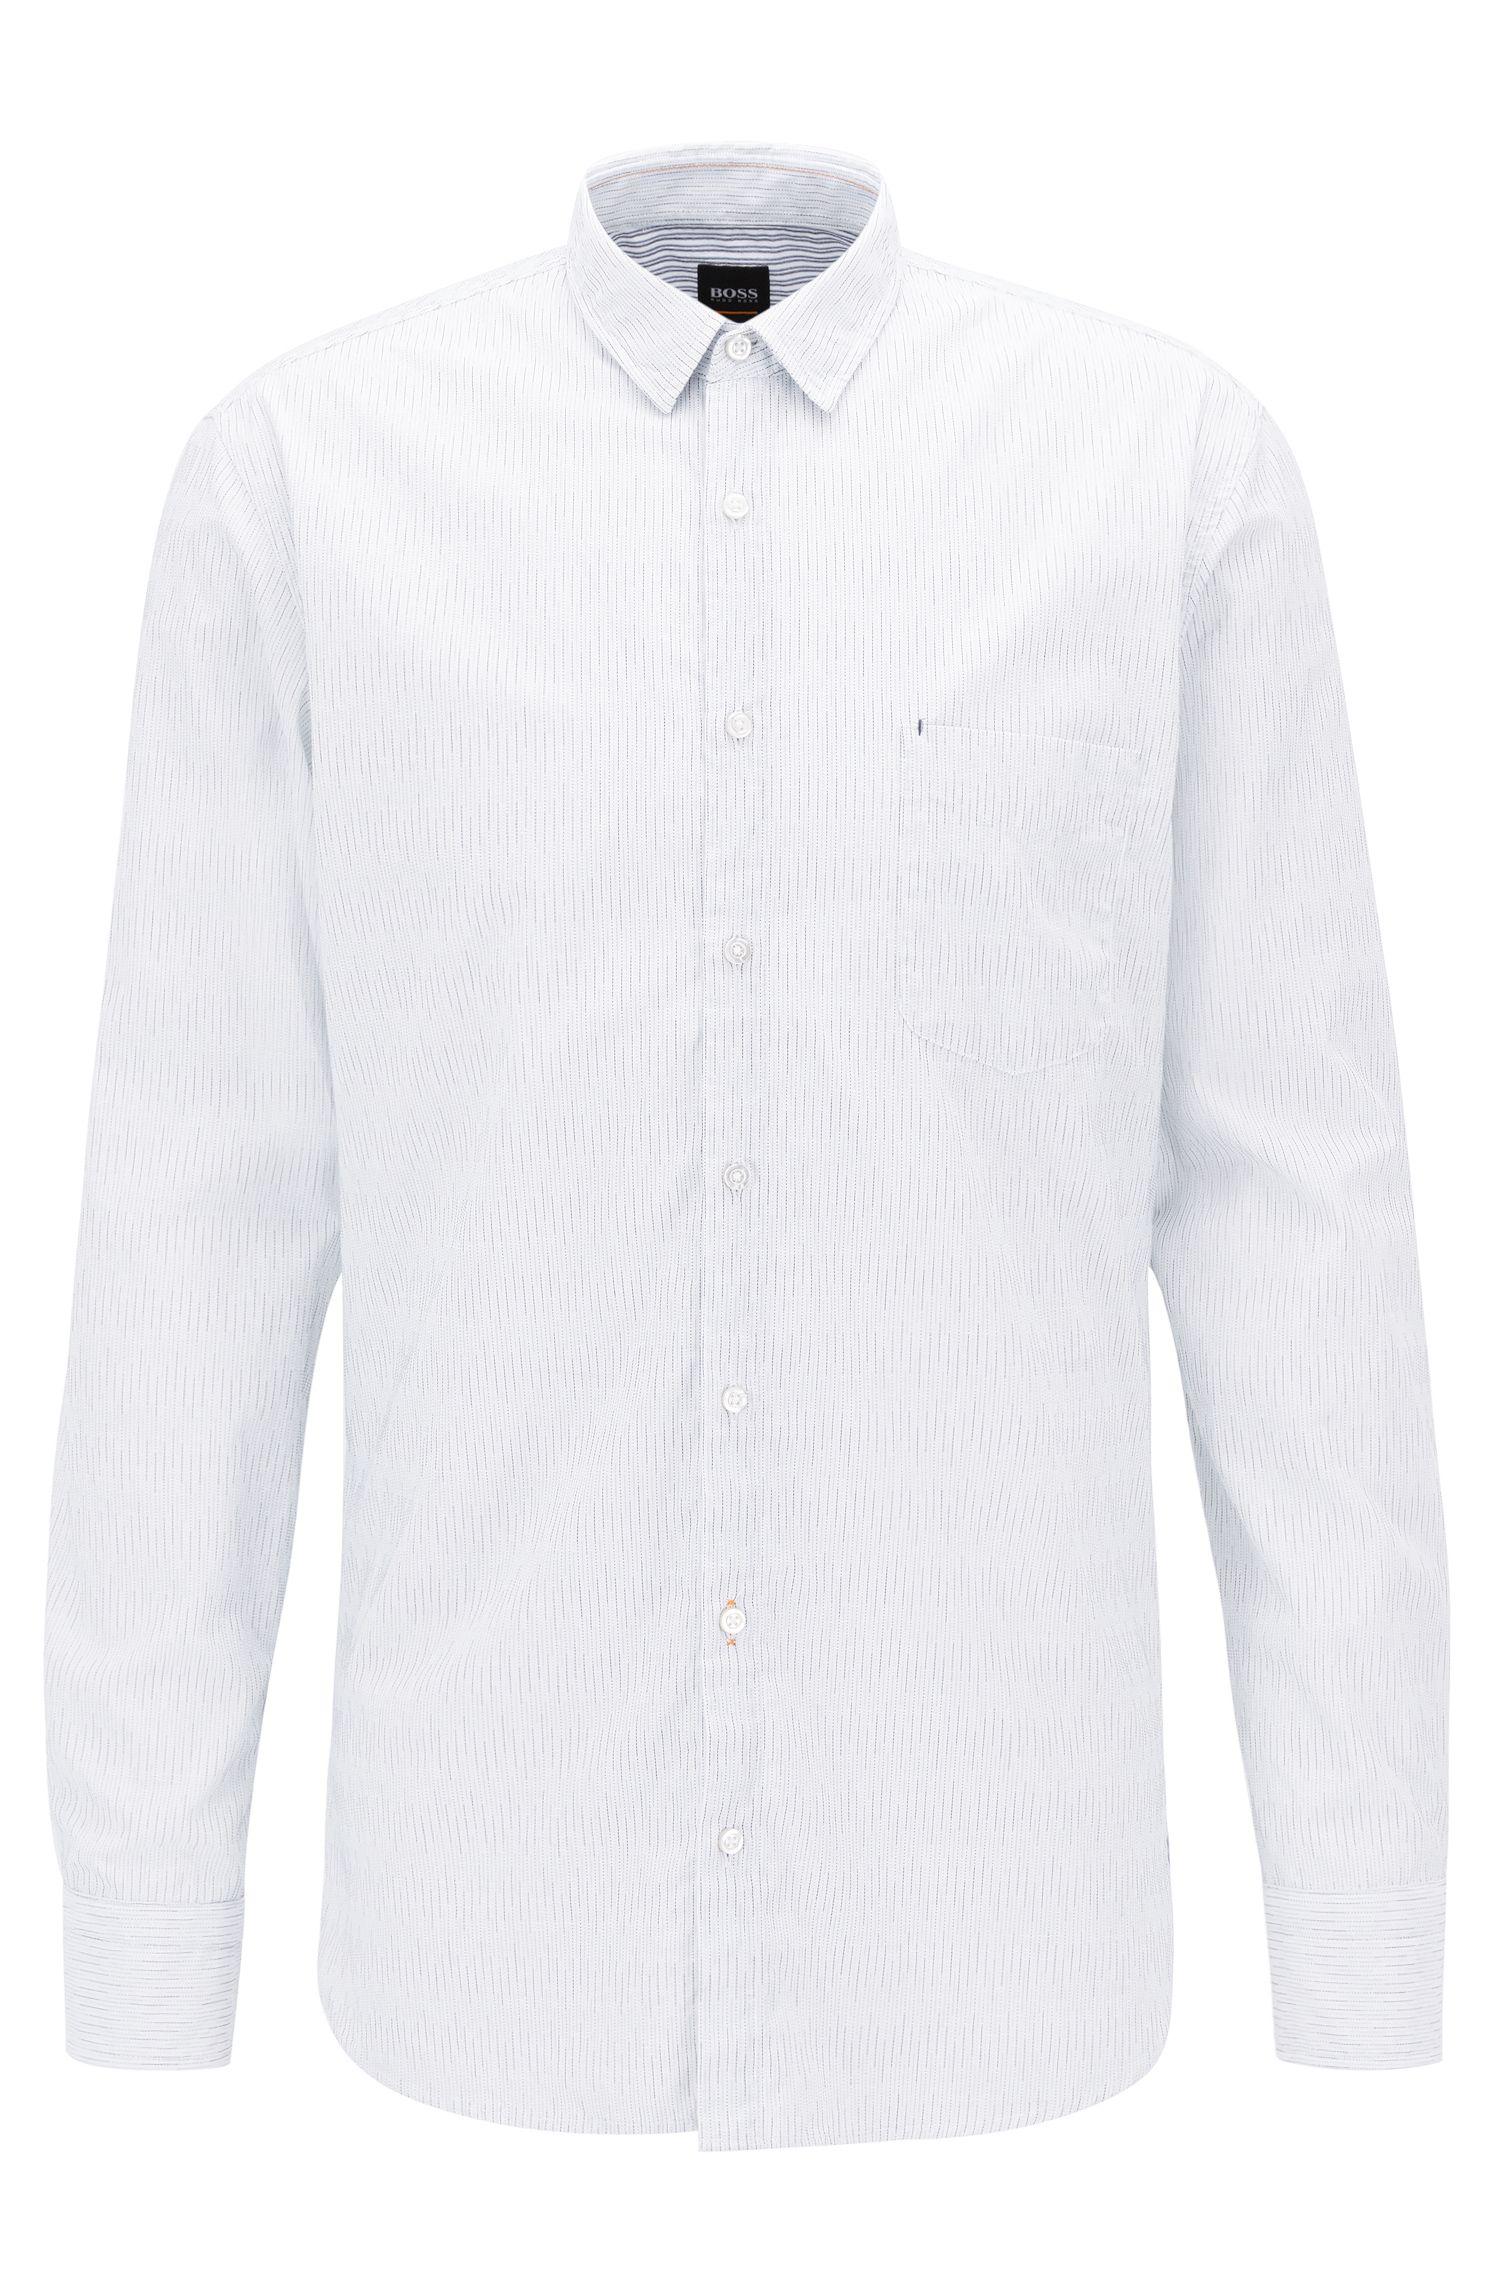 Cotton Broken Stripe Sport Shirt, Slim Fit | Cattitude